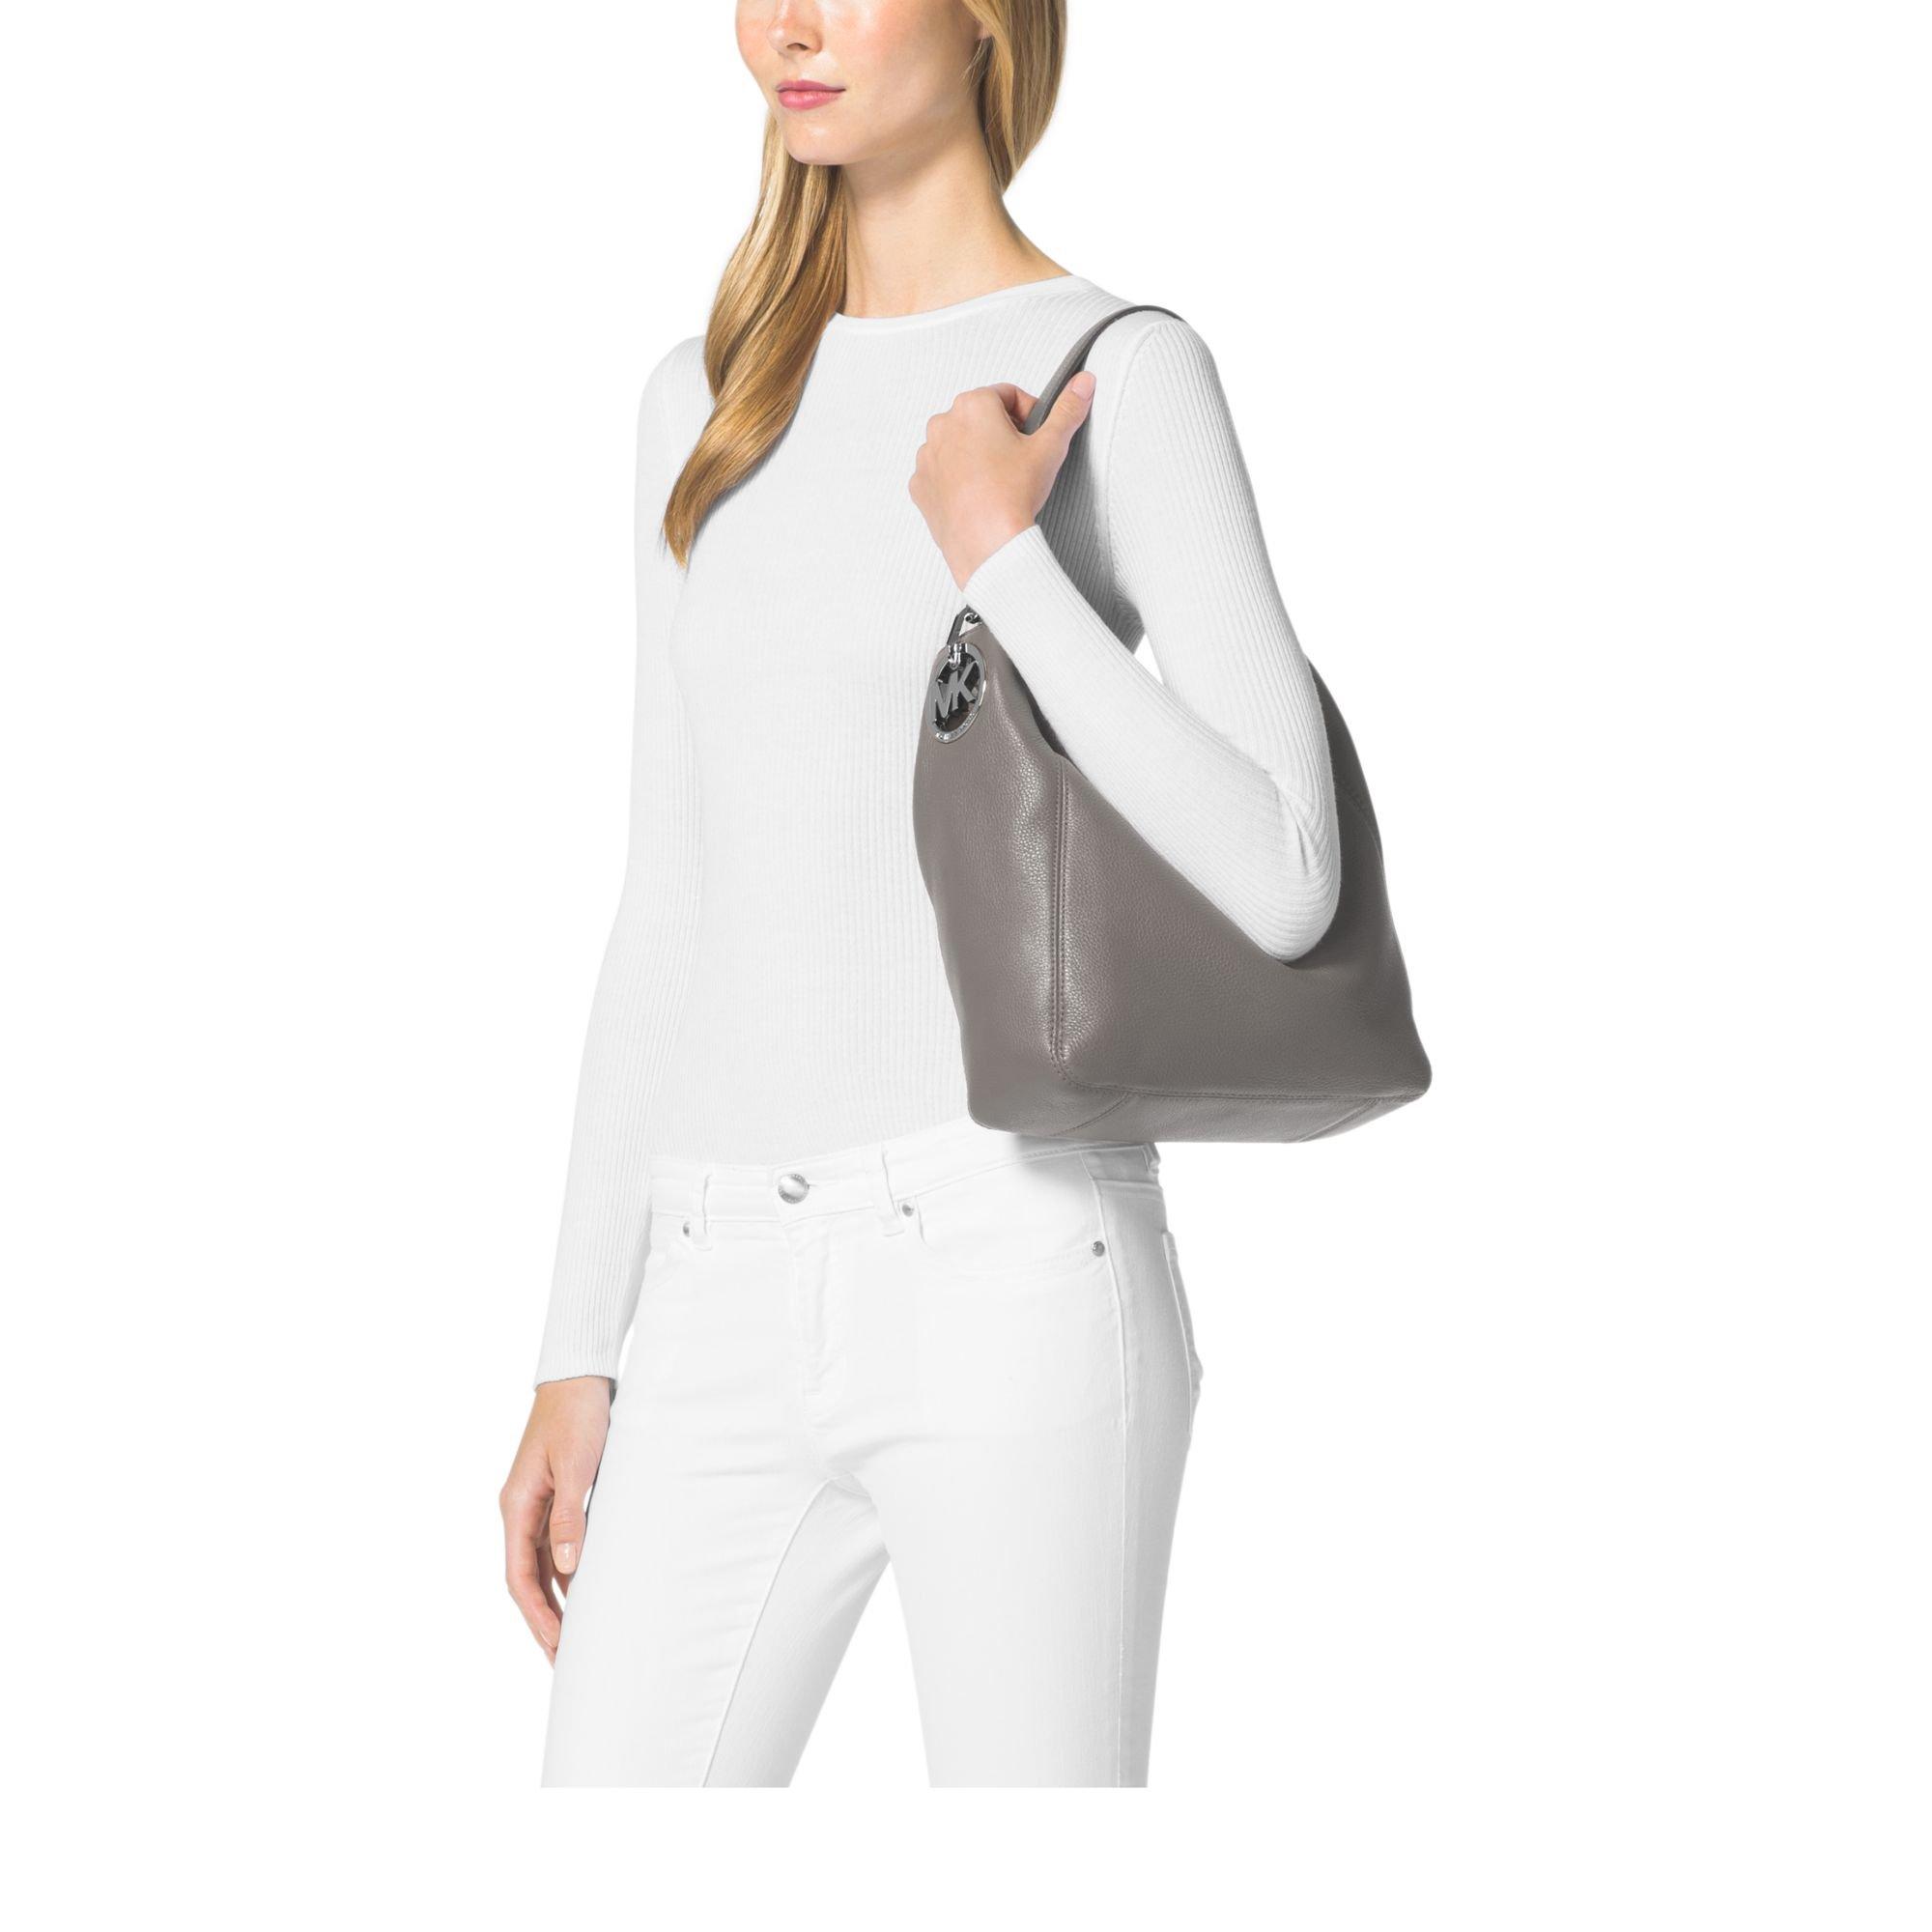 a699ebf1611a Michael Kors Fulton Medium Leather Shoulder Bag in Gray - Lyst